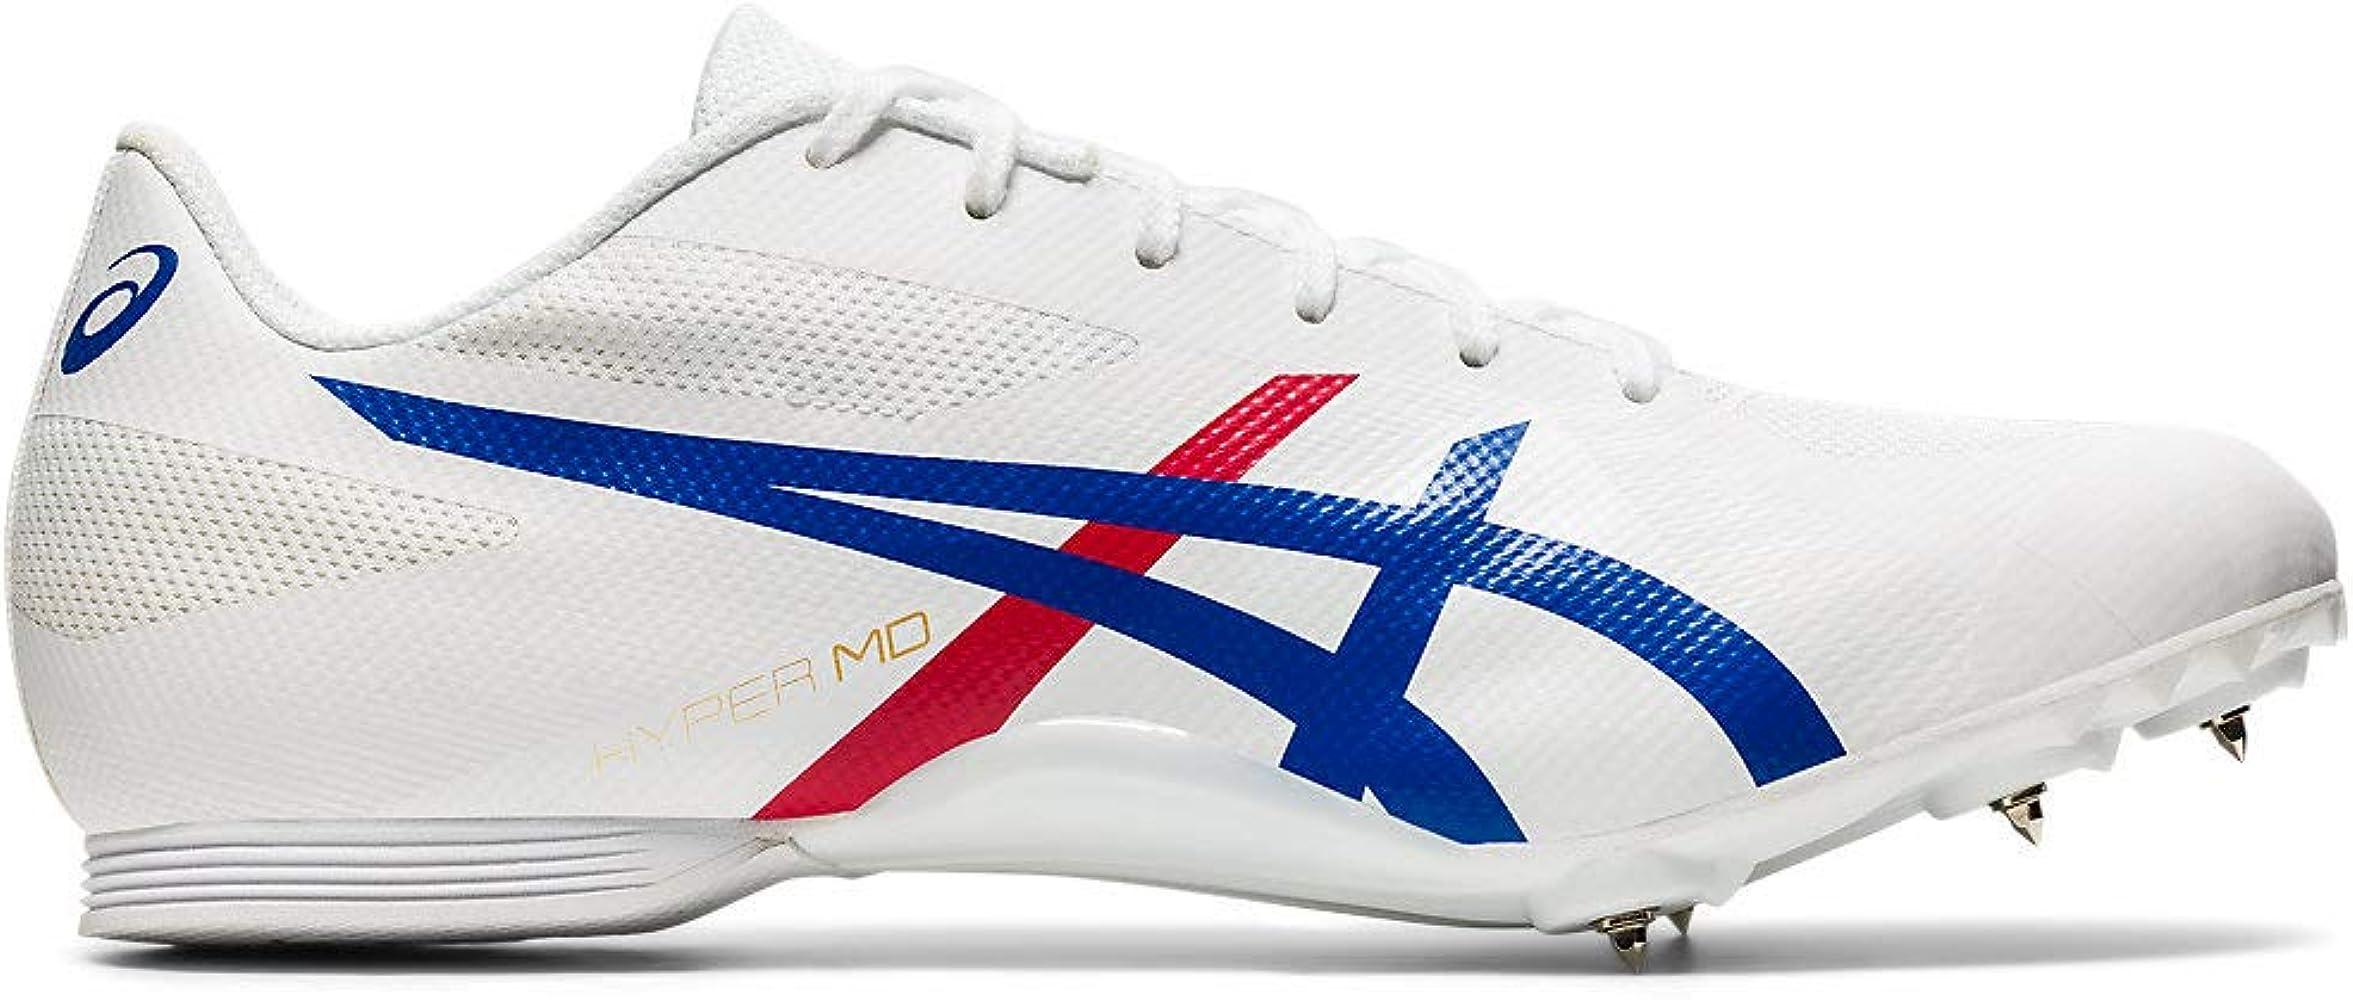 ASICS Unisex Hyper MD 7 Track & Field Shoes